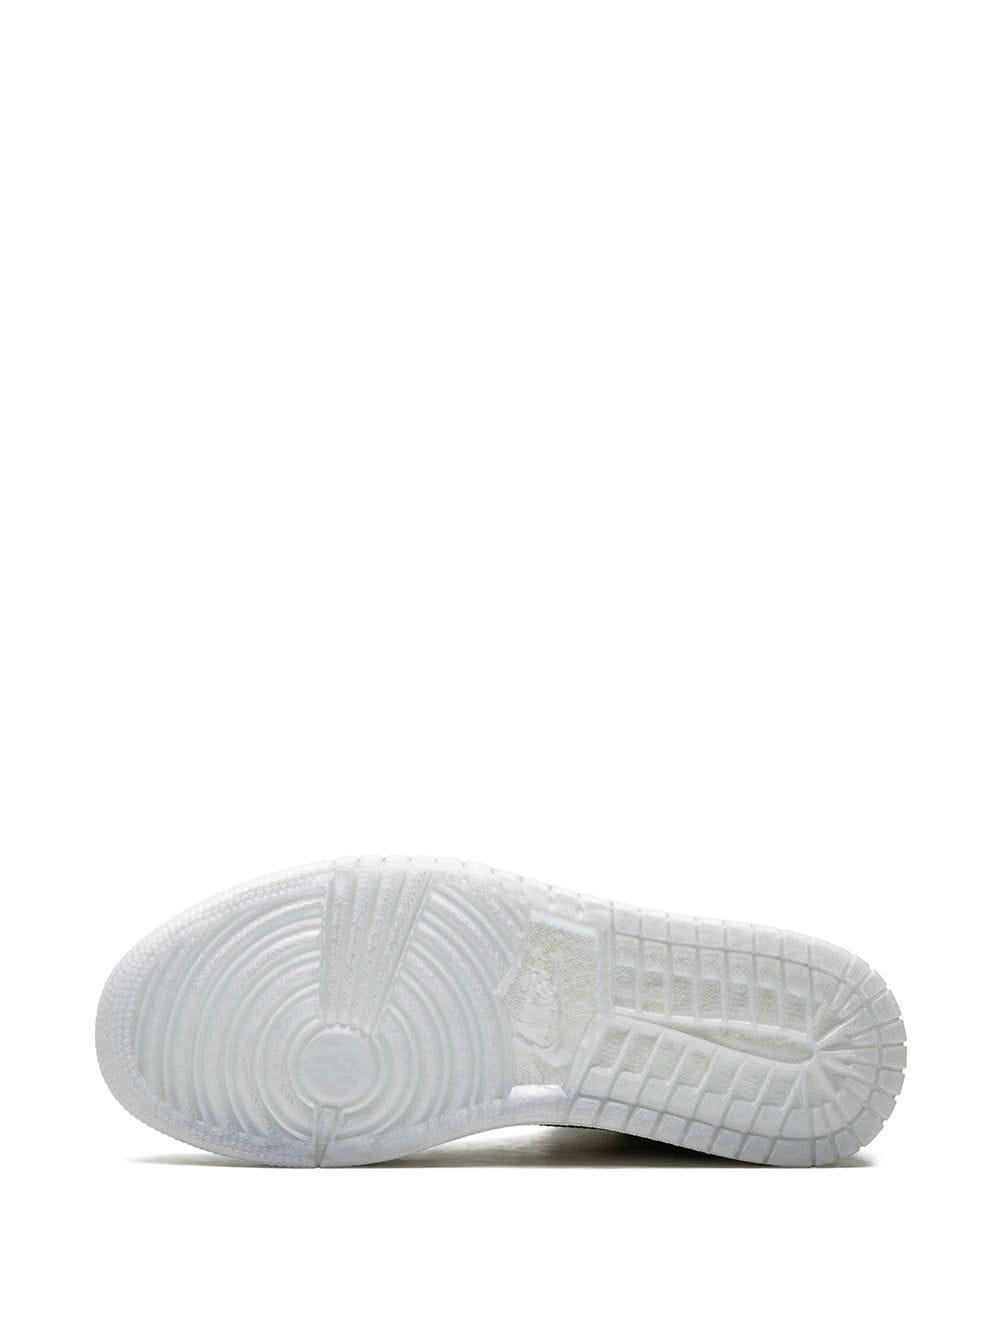 Zapatillas WMNS Air 1 Retro Nike